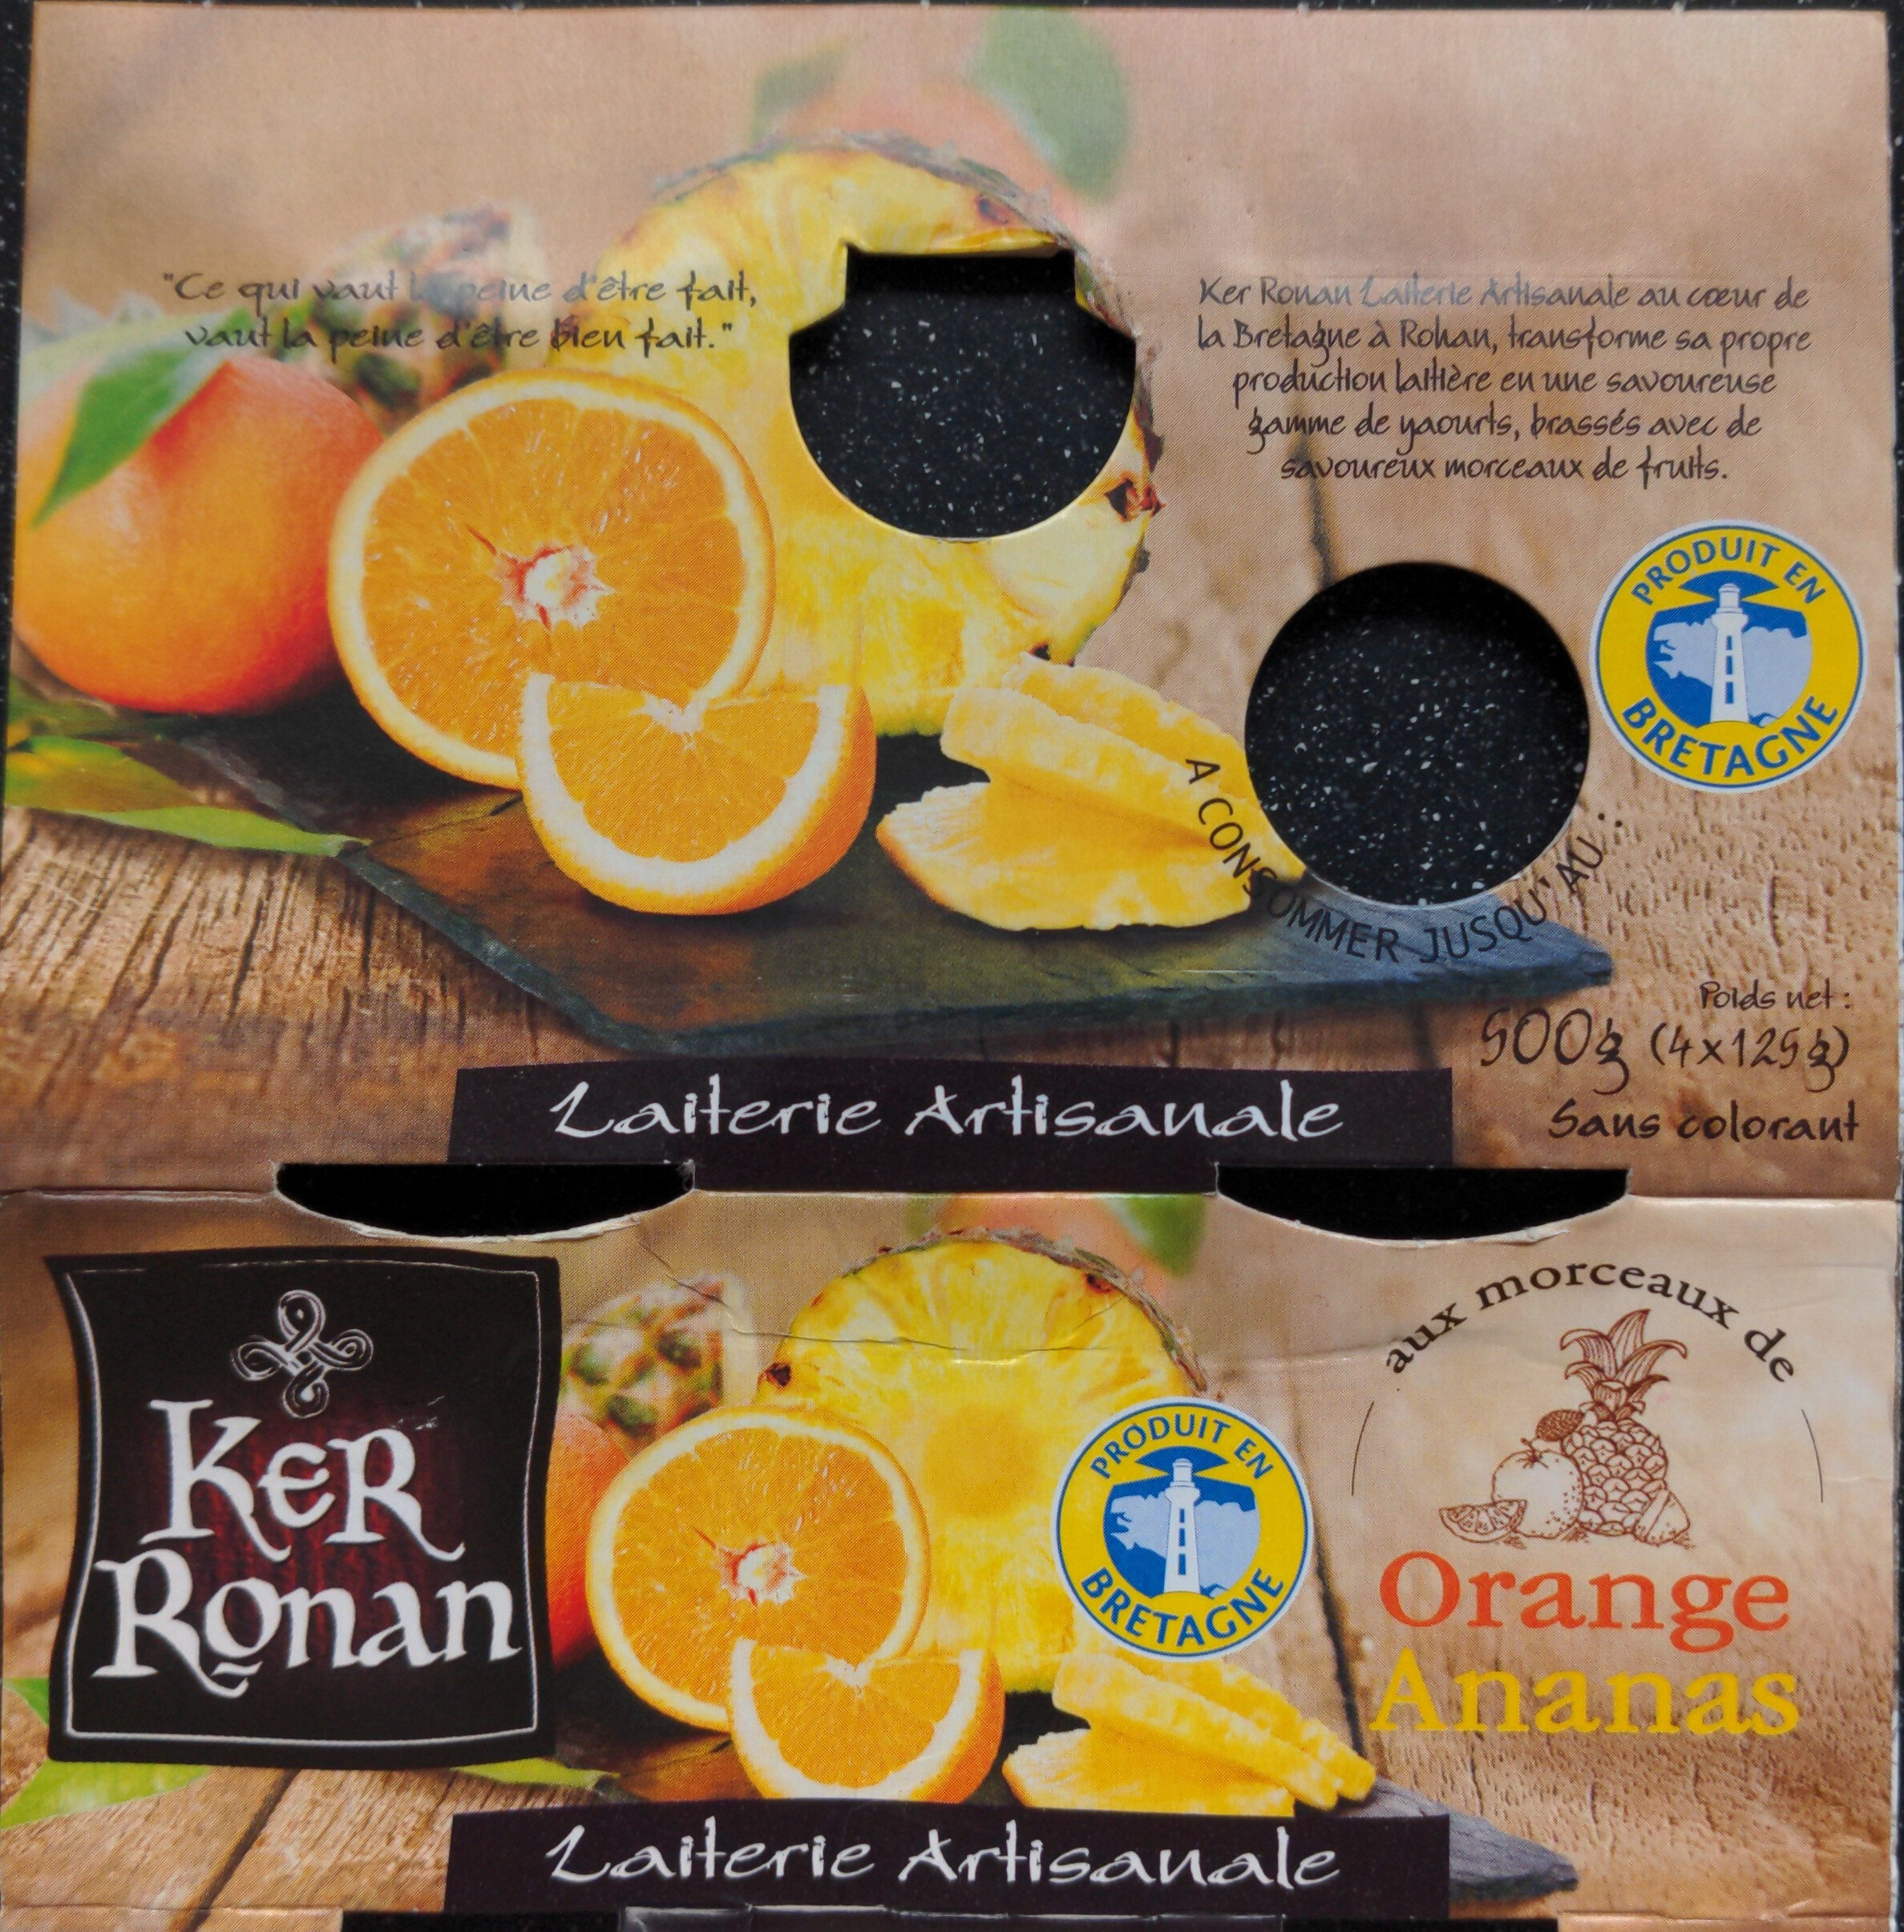 Yaourt Ker Ronan Orange/Ananas - Produit - fr